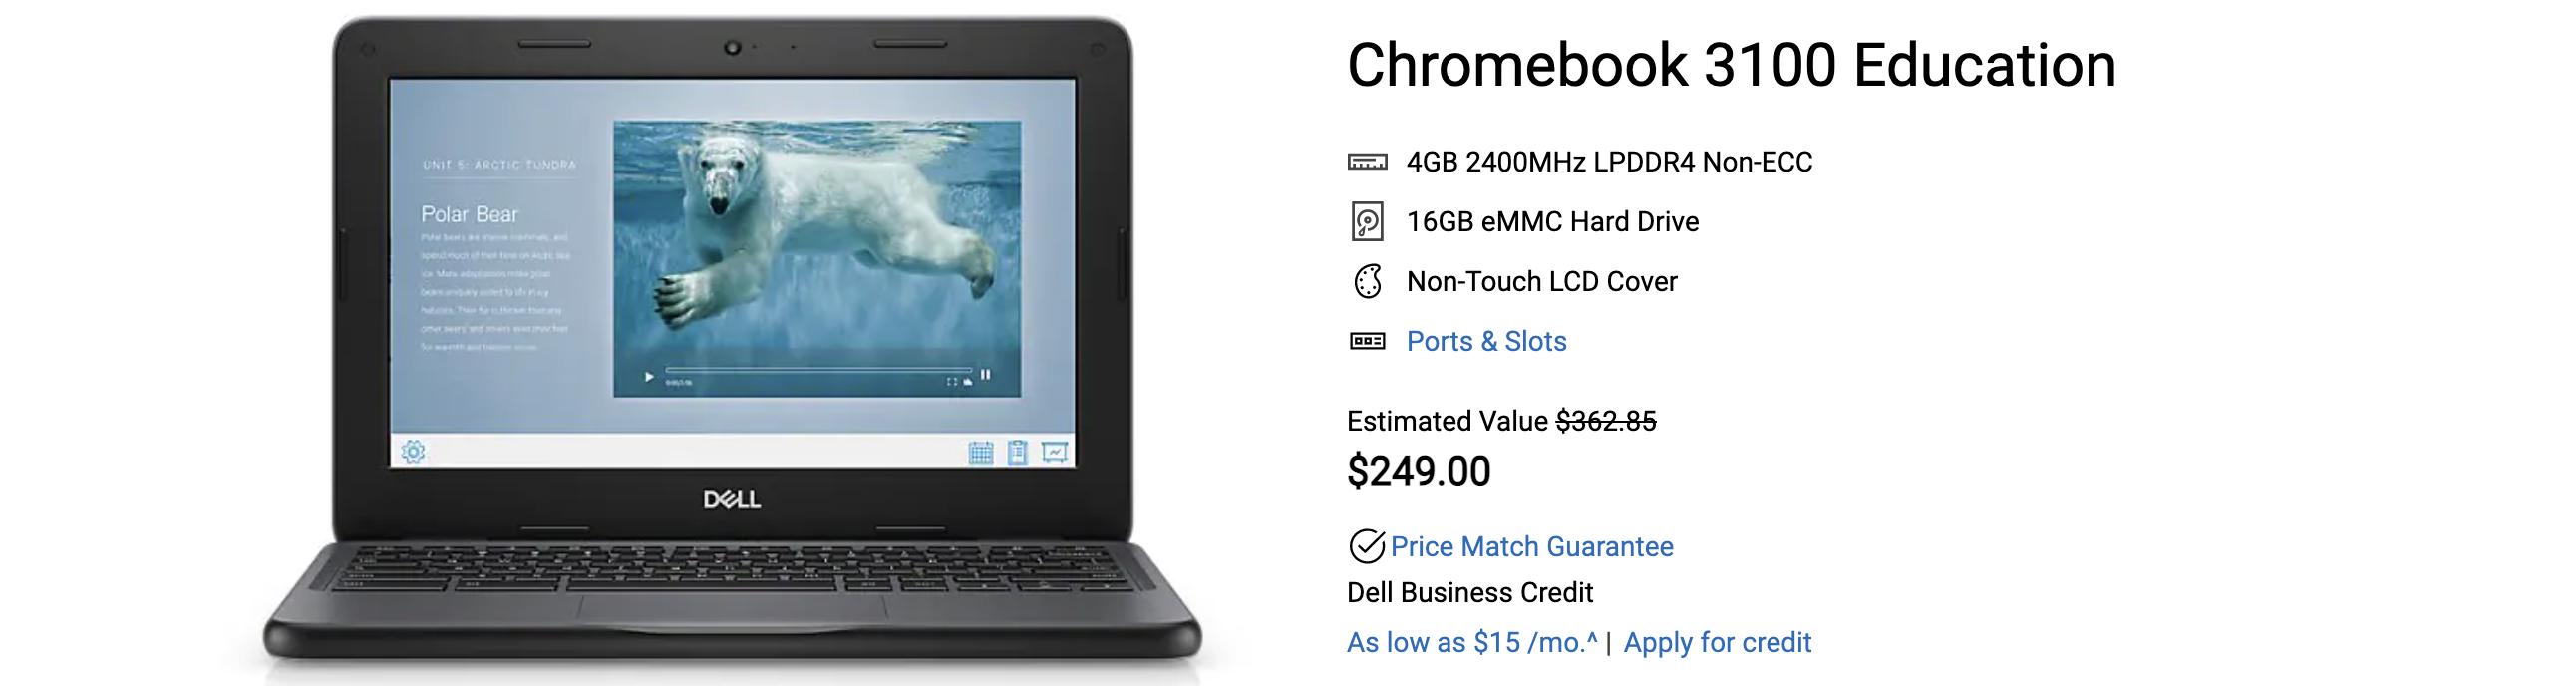 The Dell Chromebook 3100